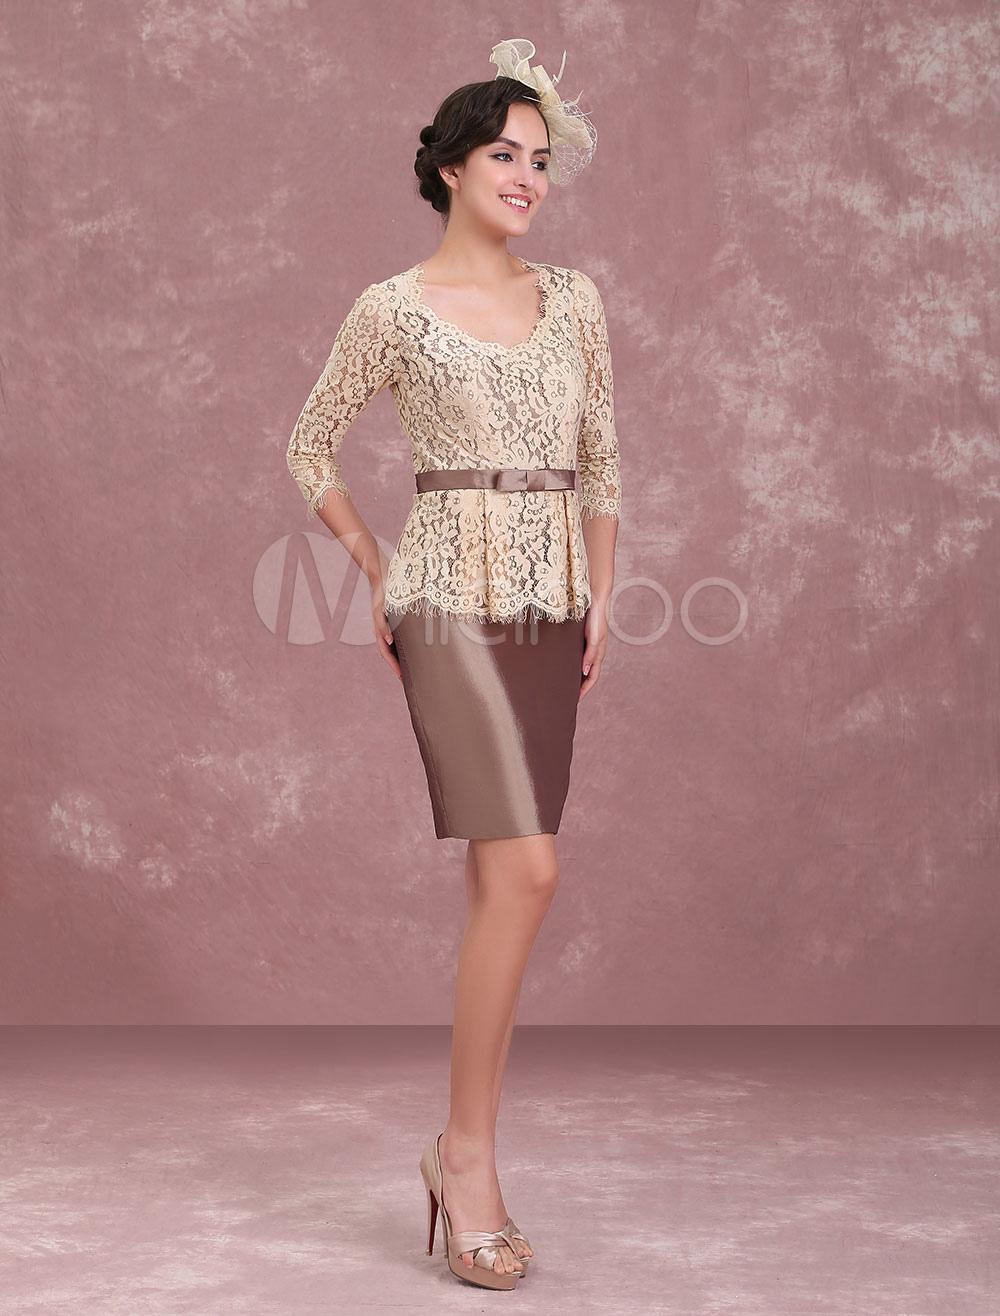 Mother Of The Bride Dresses Lace Taffeta Sash Sheath Brown Short Wedding Guest Dress